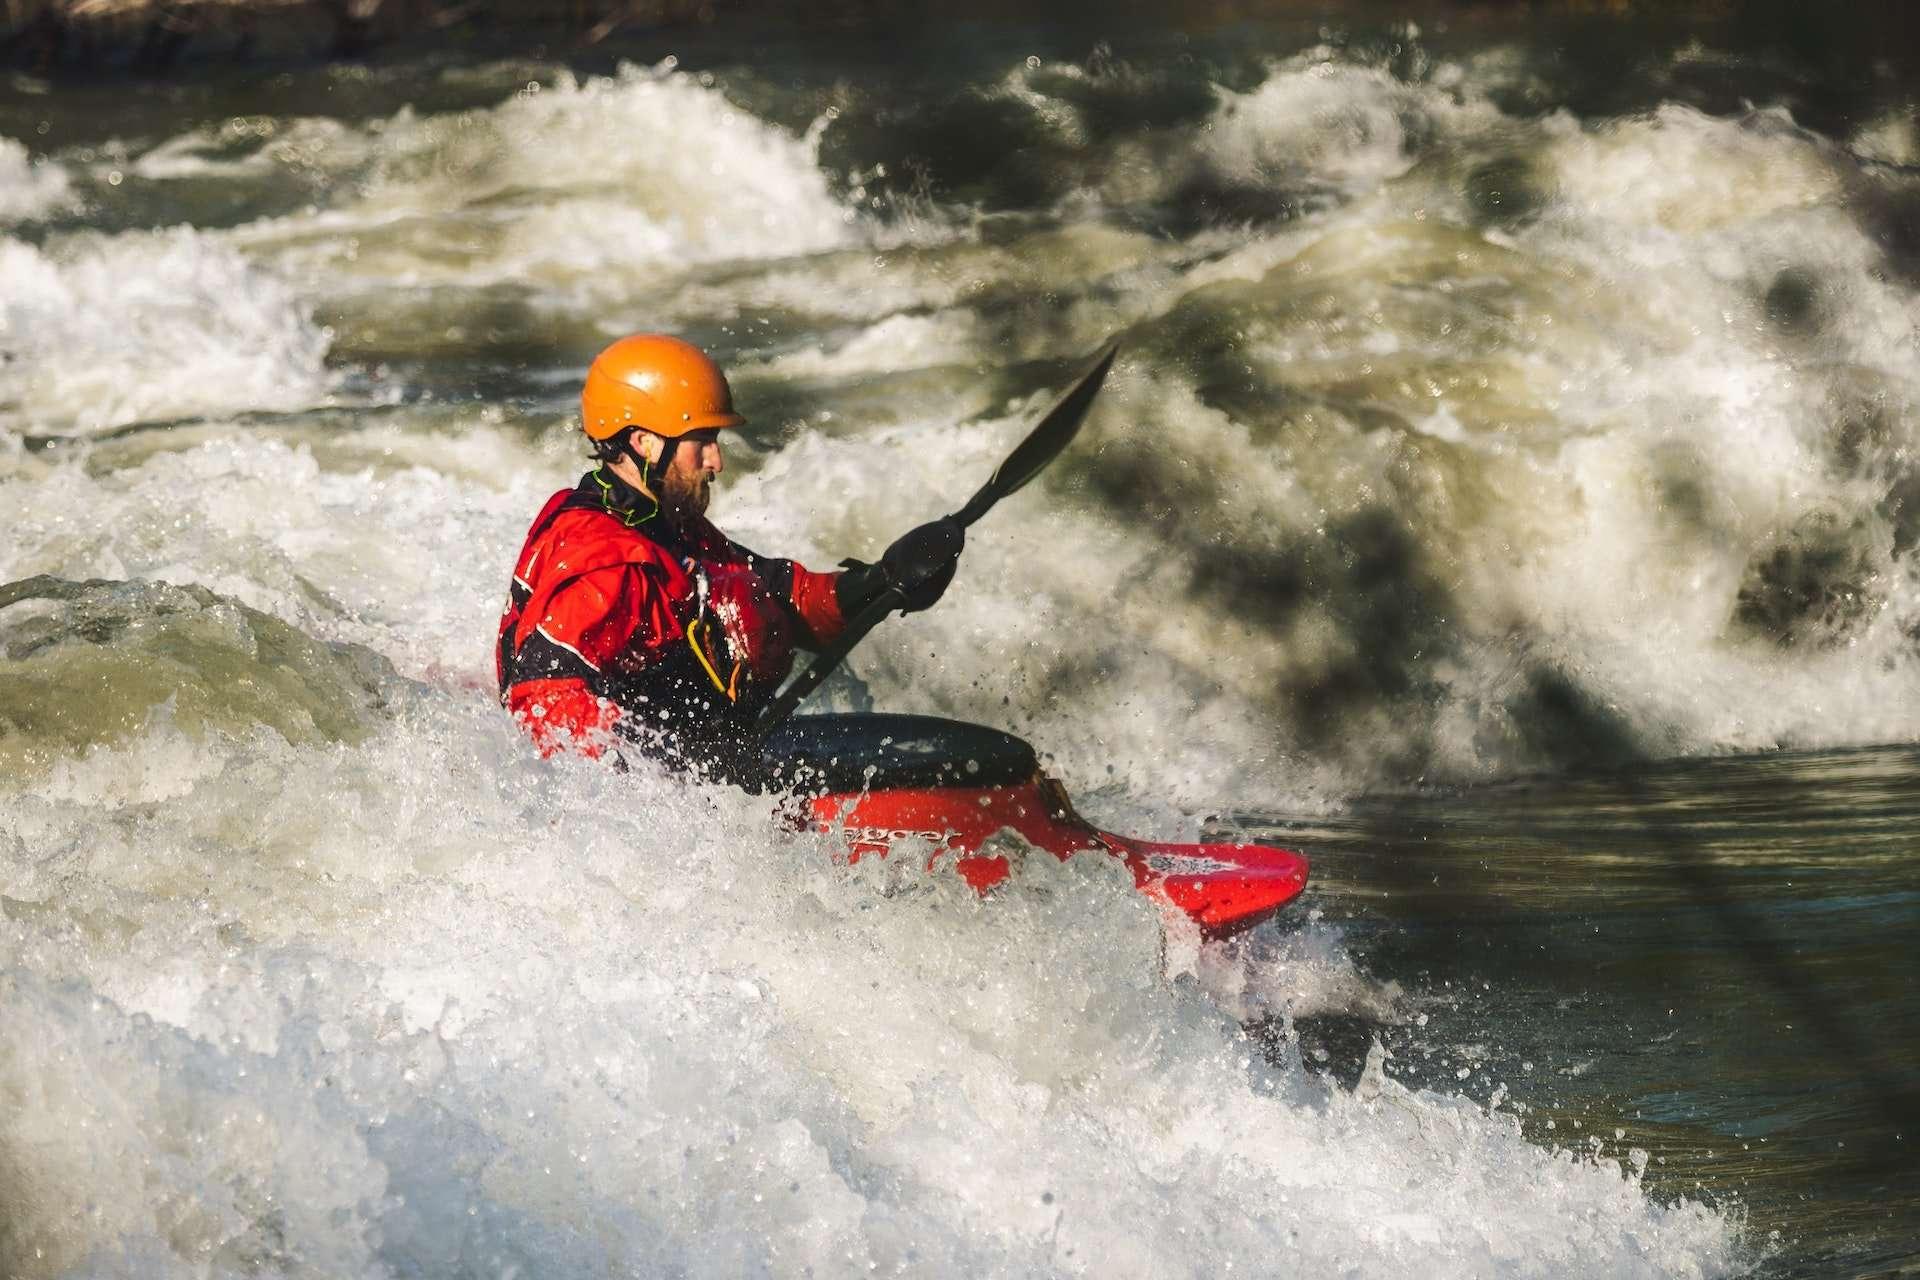 kano-rafting scooterverhuurlimburg